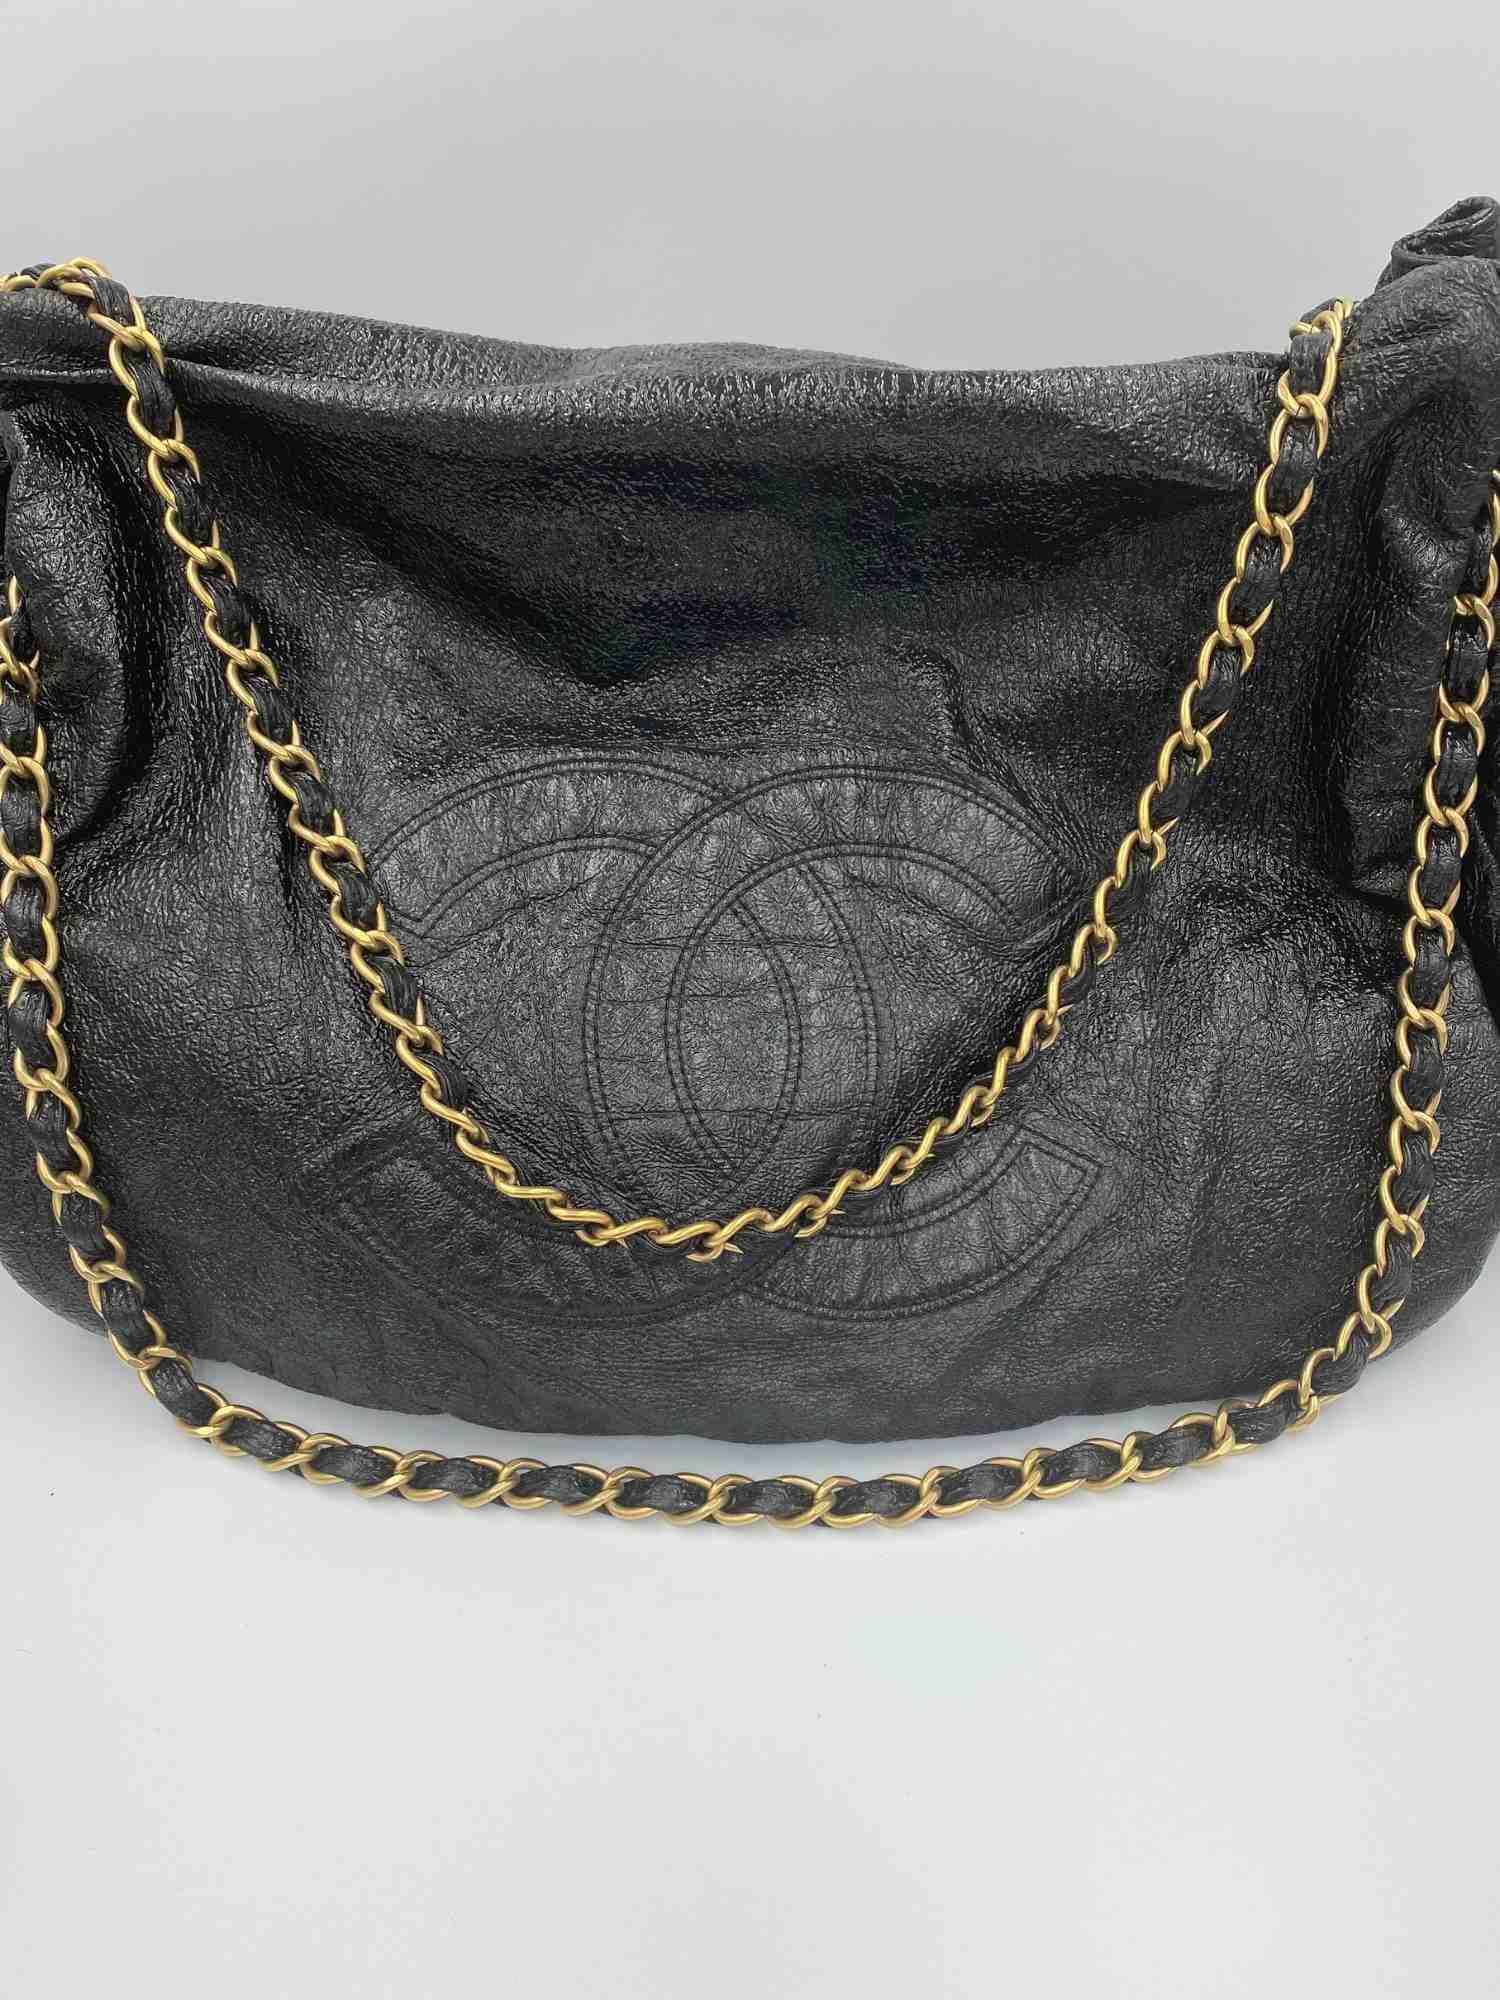 Bolsa Chanel Trimmed Accordion Vinil Preta